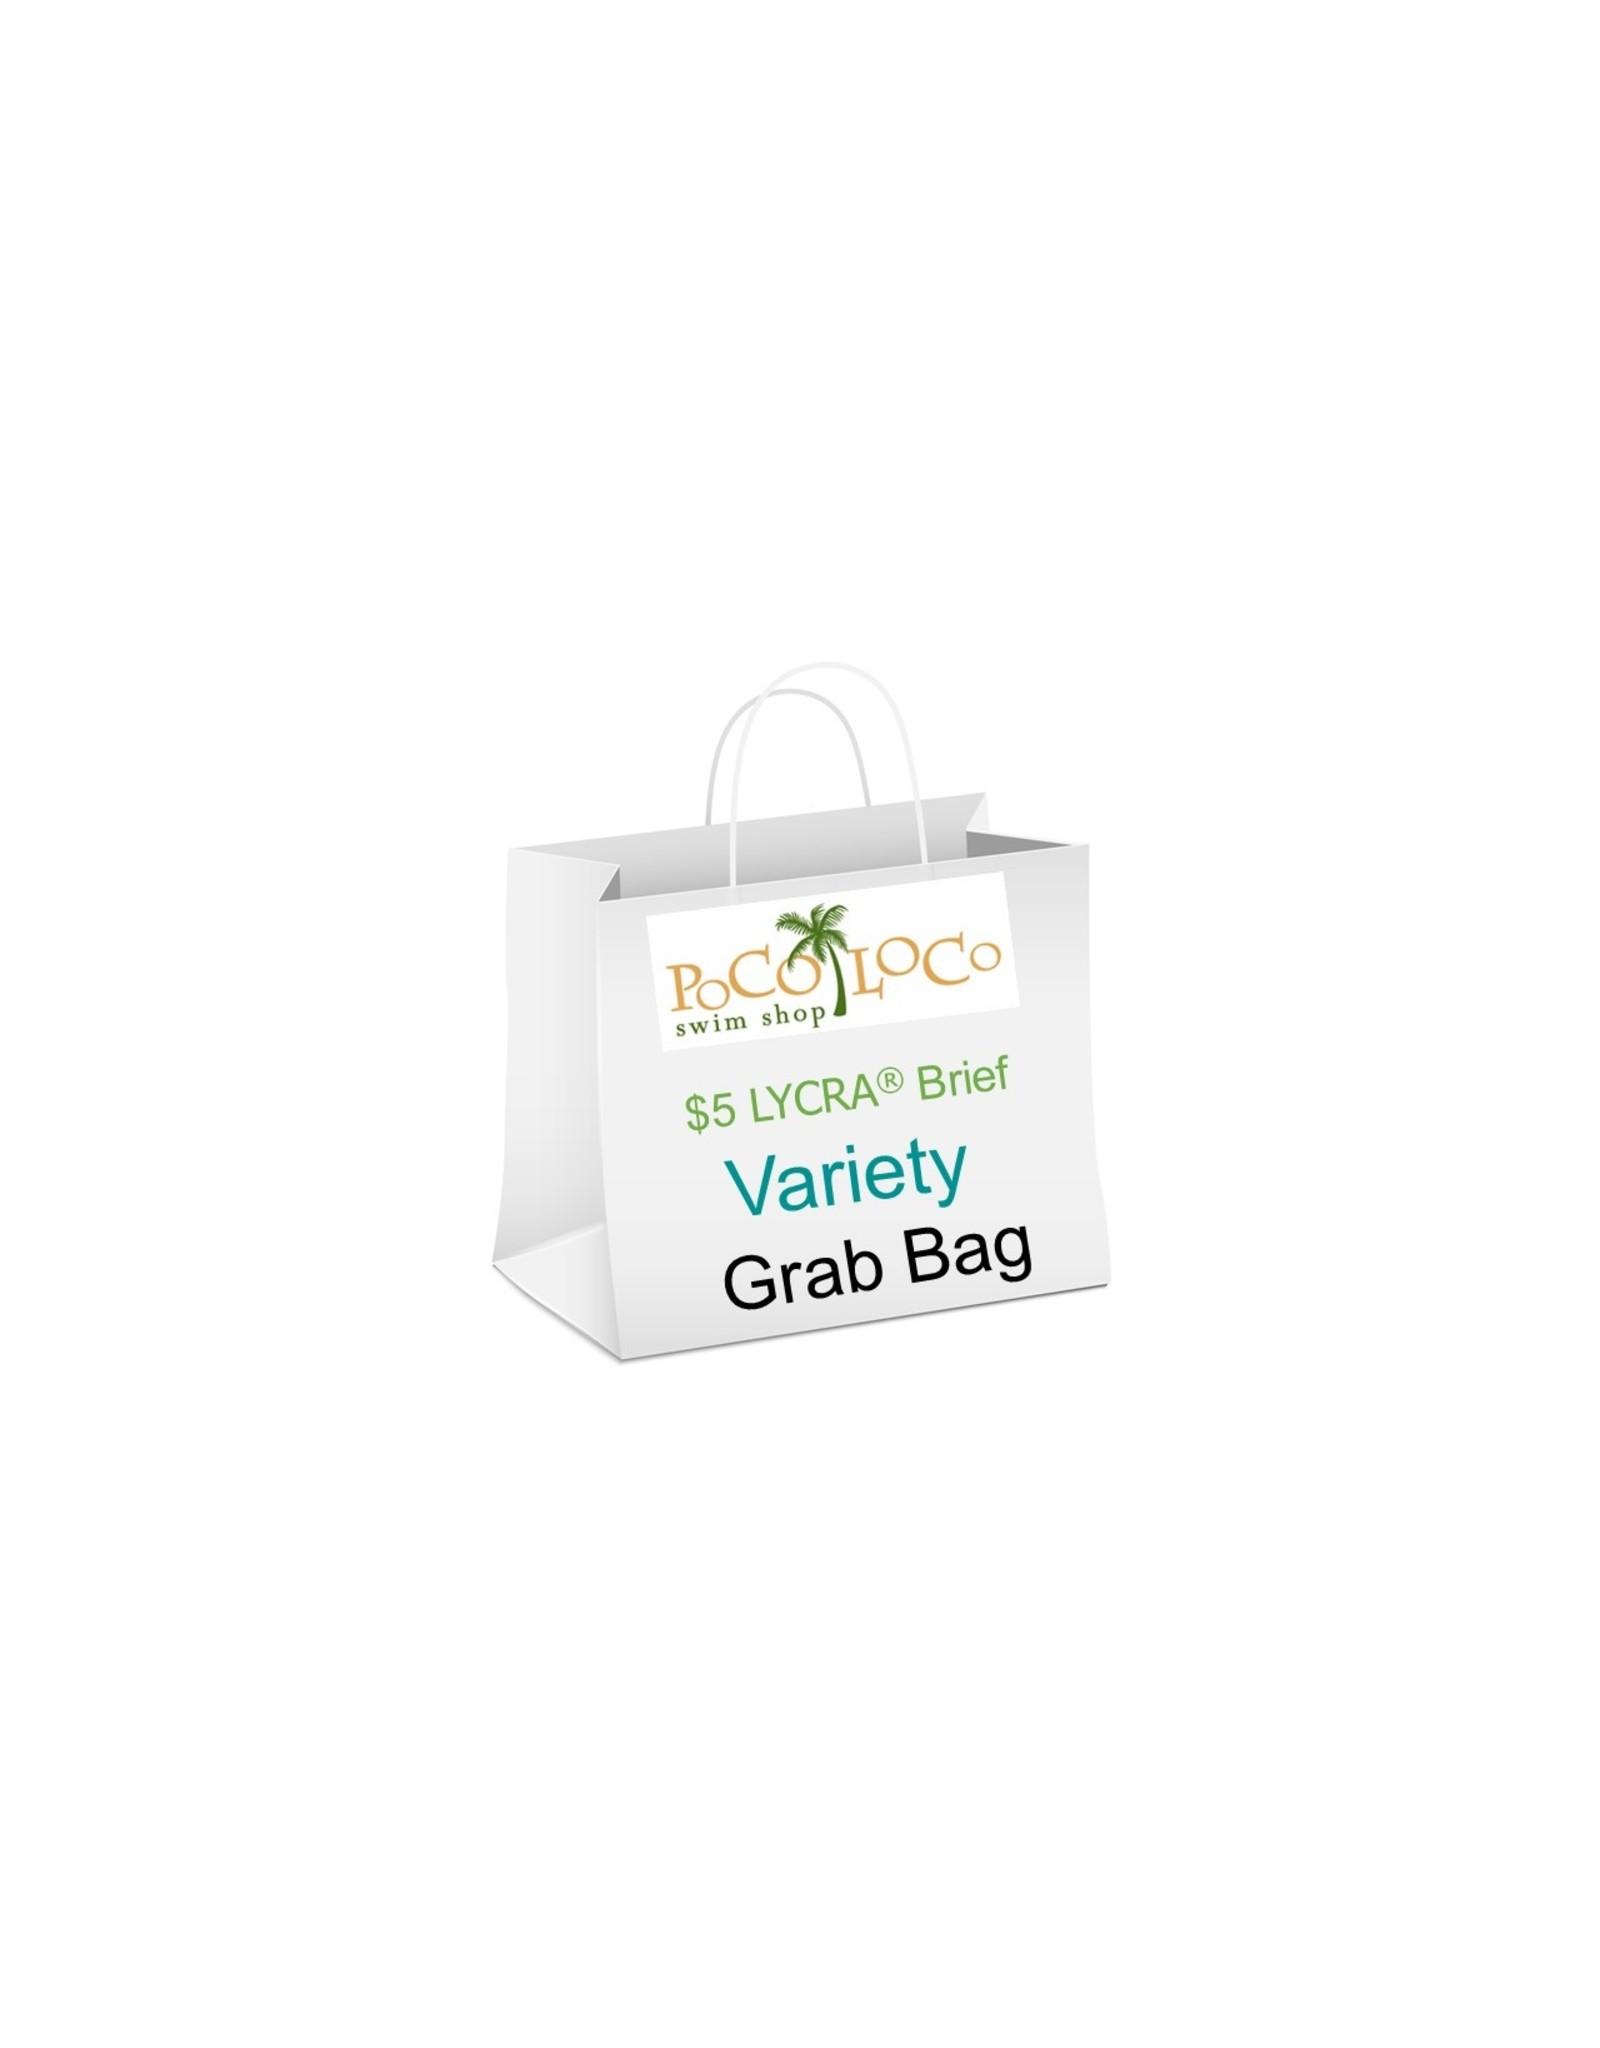 LYCRA® VARIETY GRAB BAG BRIEF